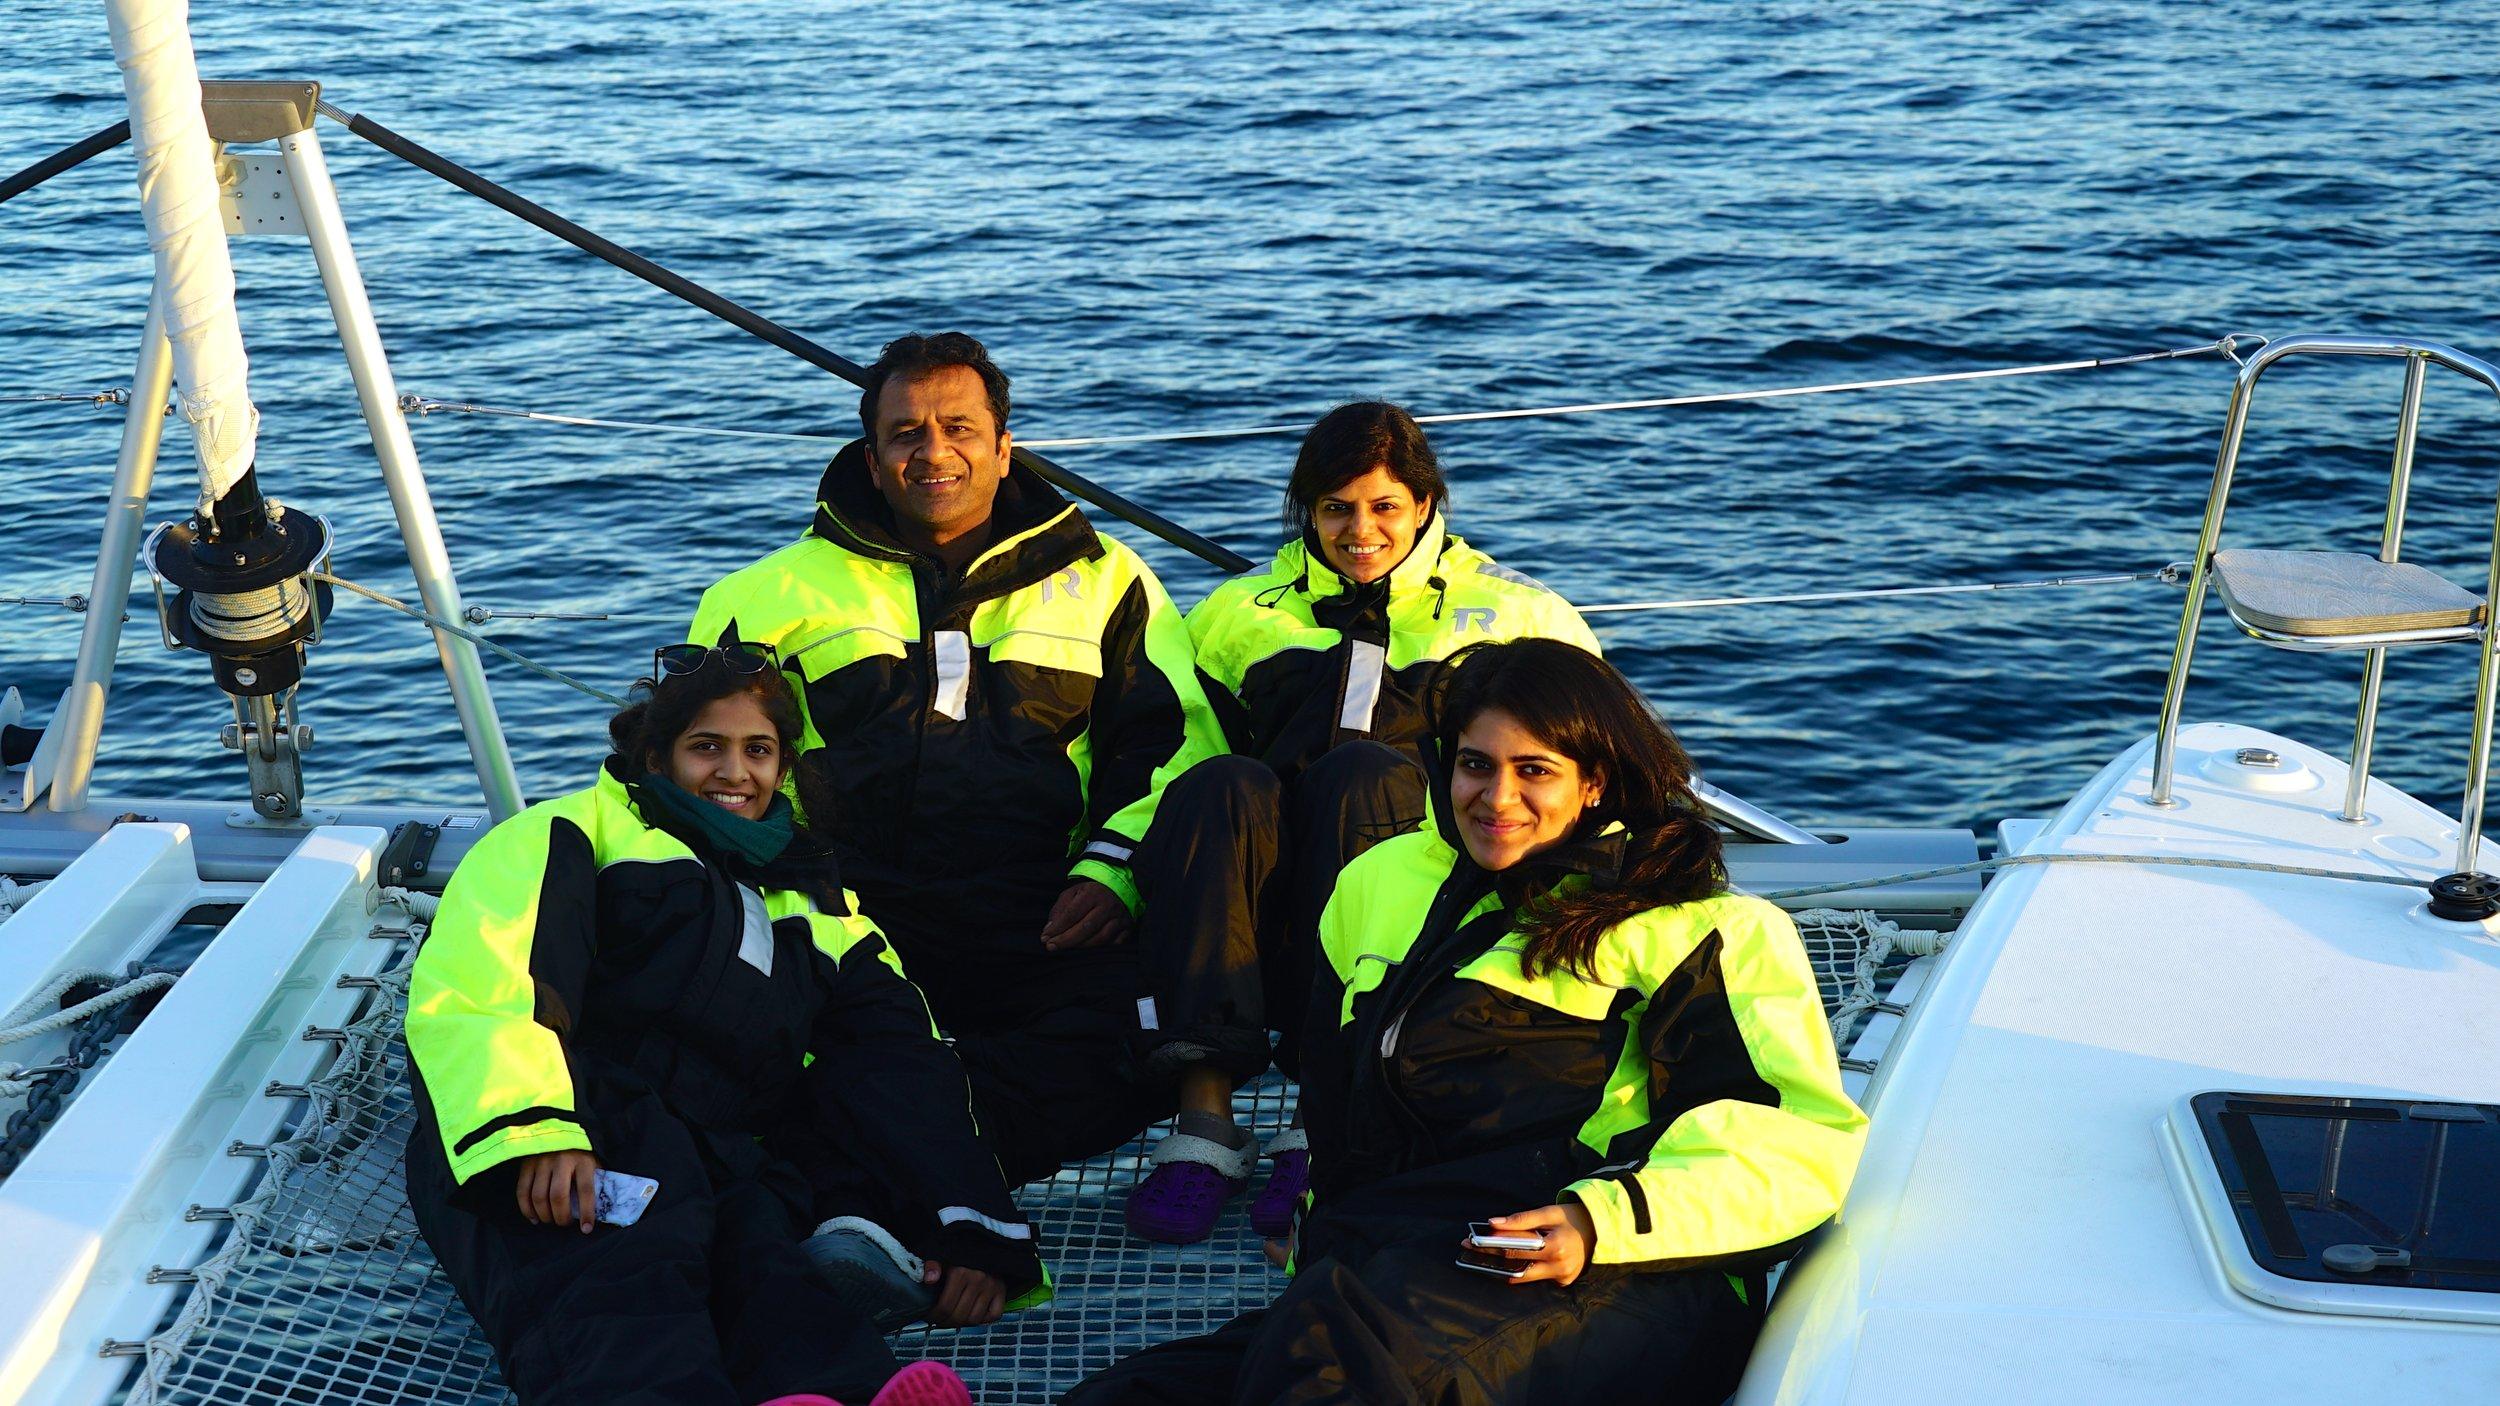 #Midnightsun #Sailing #Tromso #Boat | #Arctic Princess